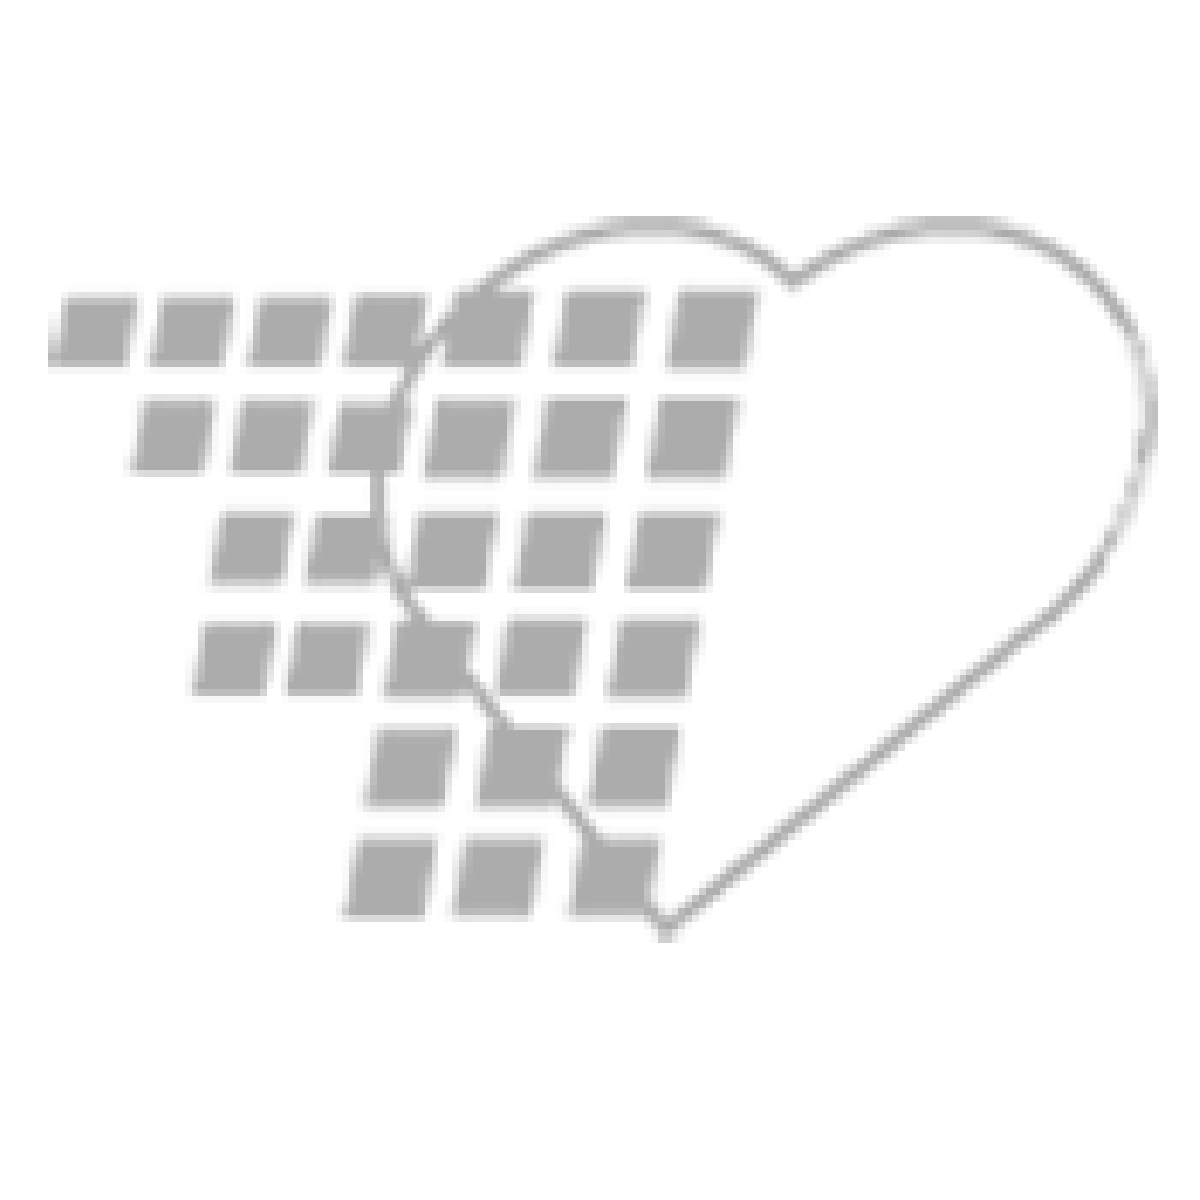 02-62-201 - Incubator - Digital